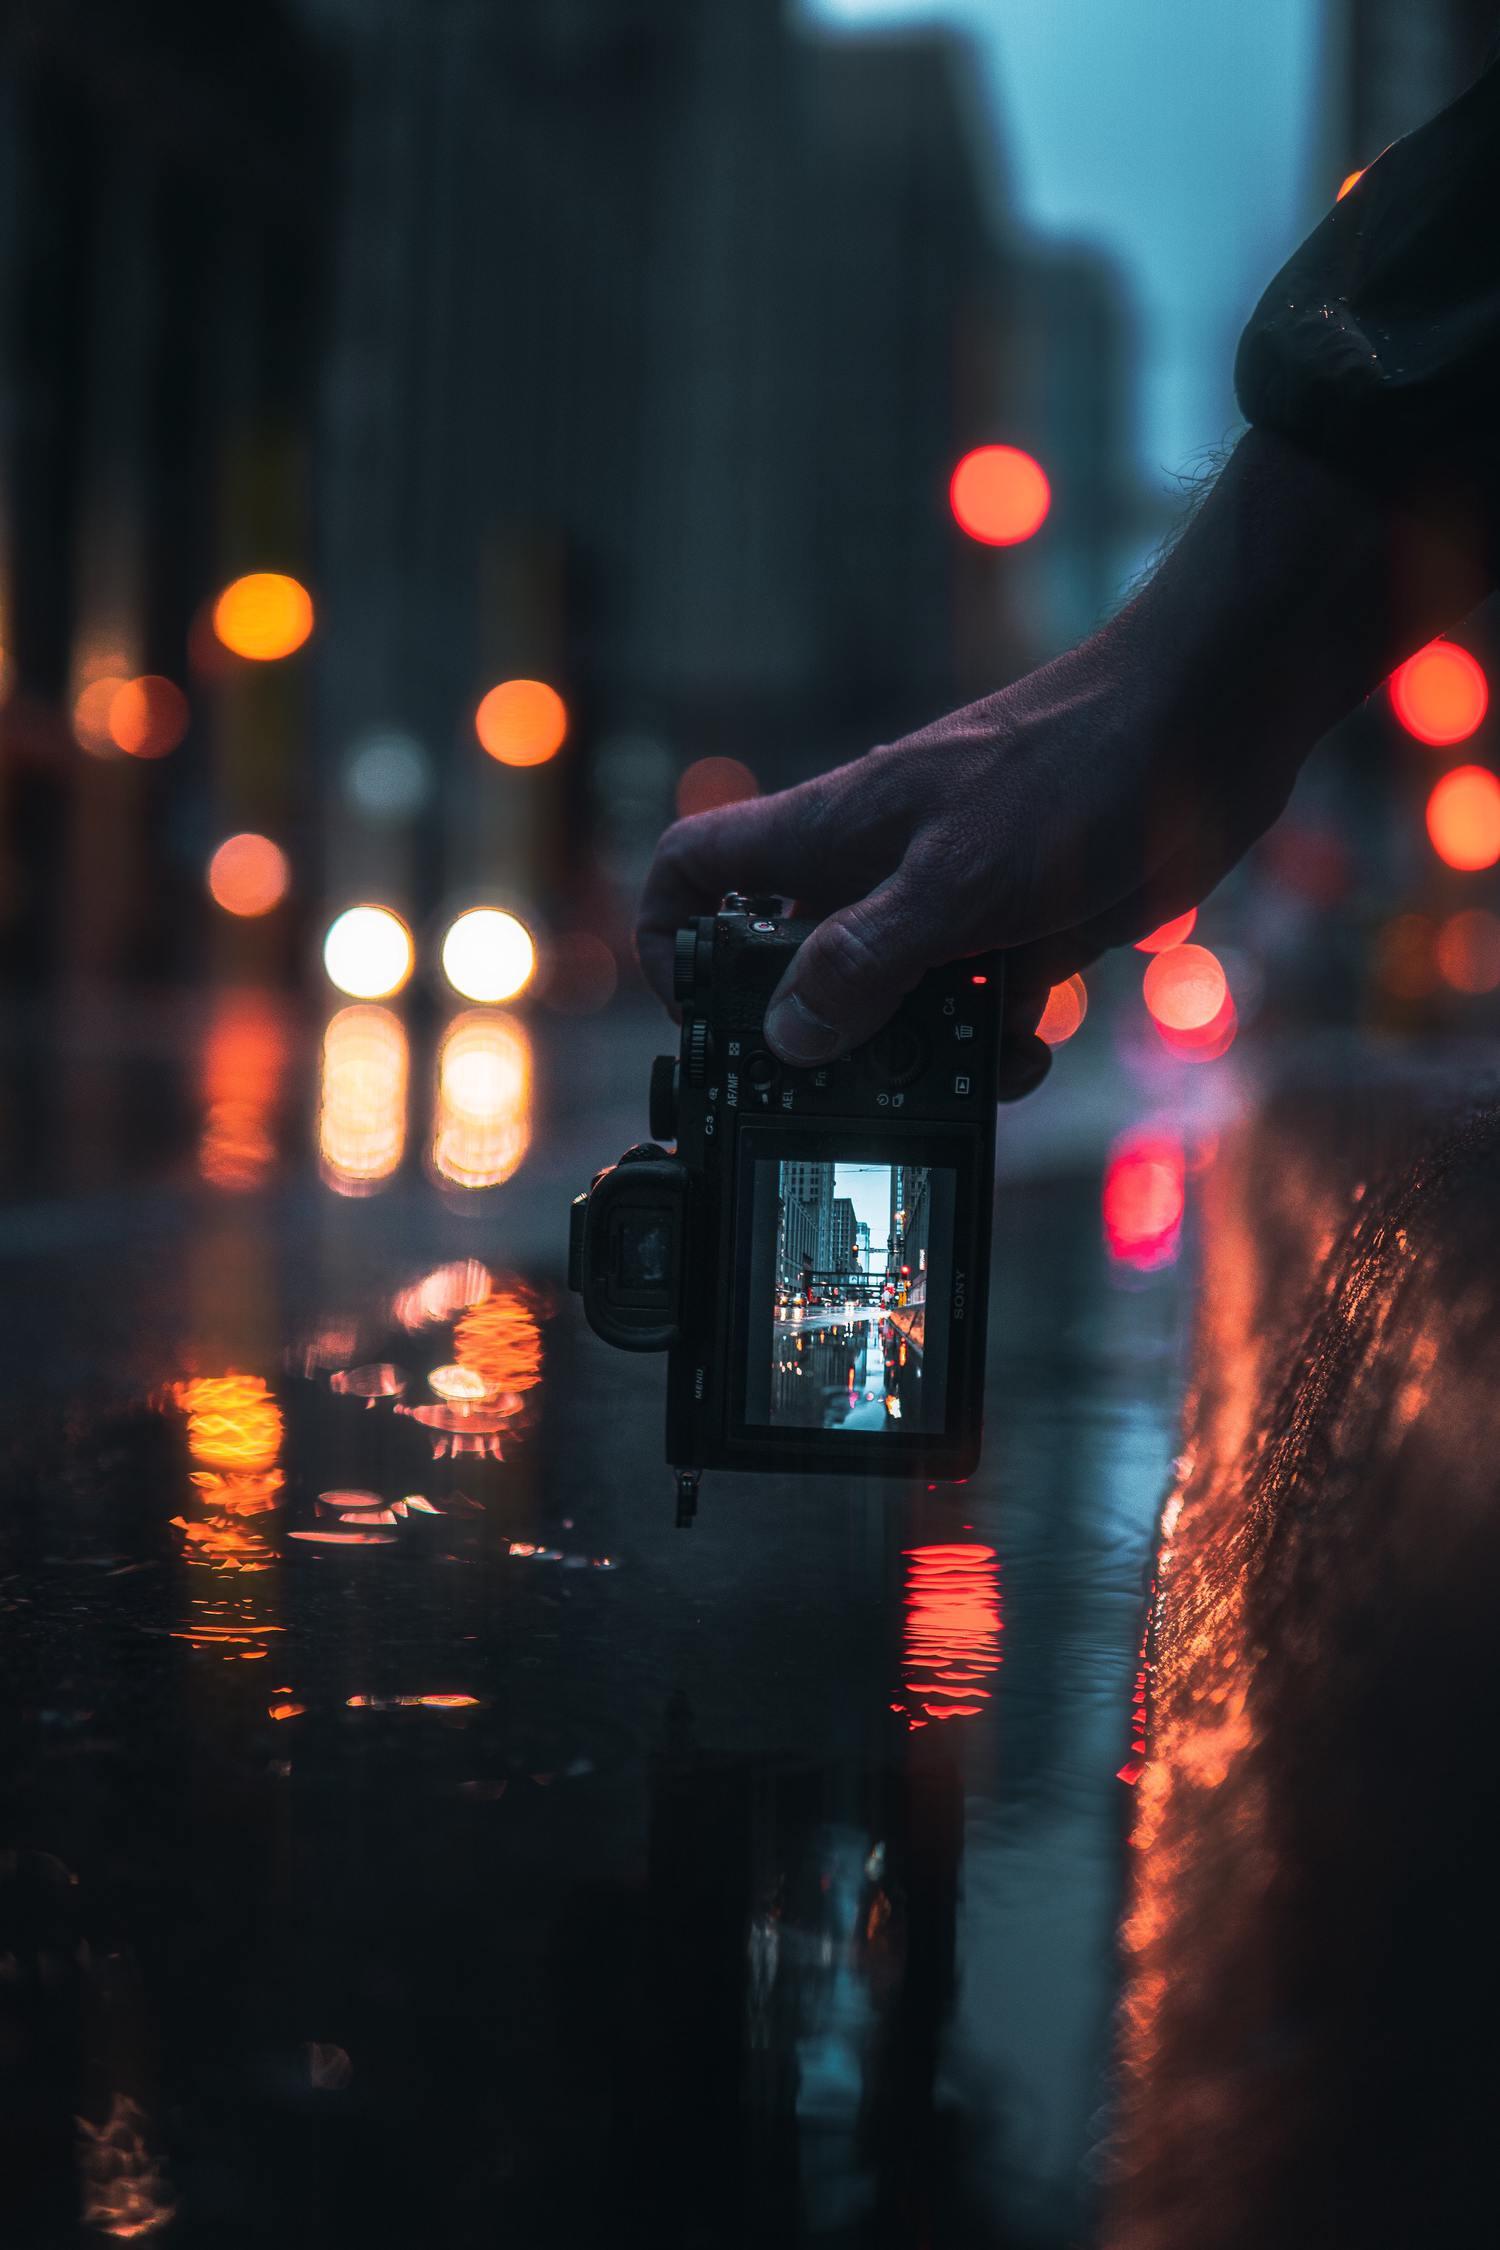 Cámara con vista de pantalla enfocando la calle de noche